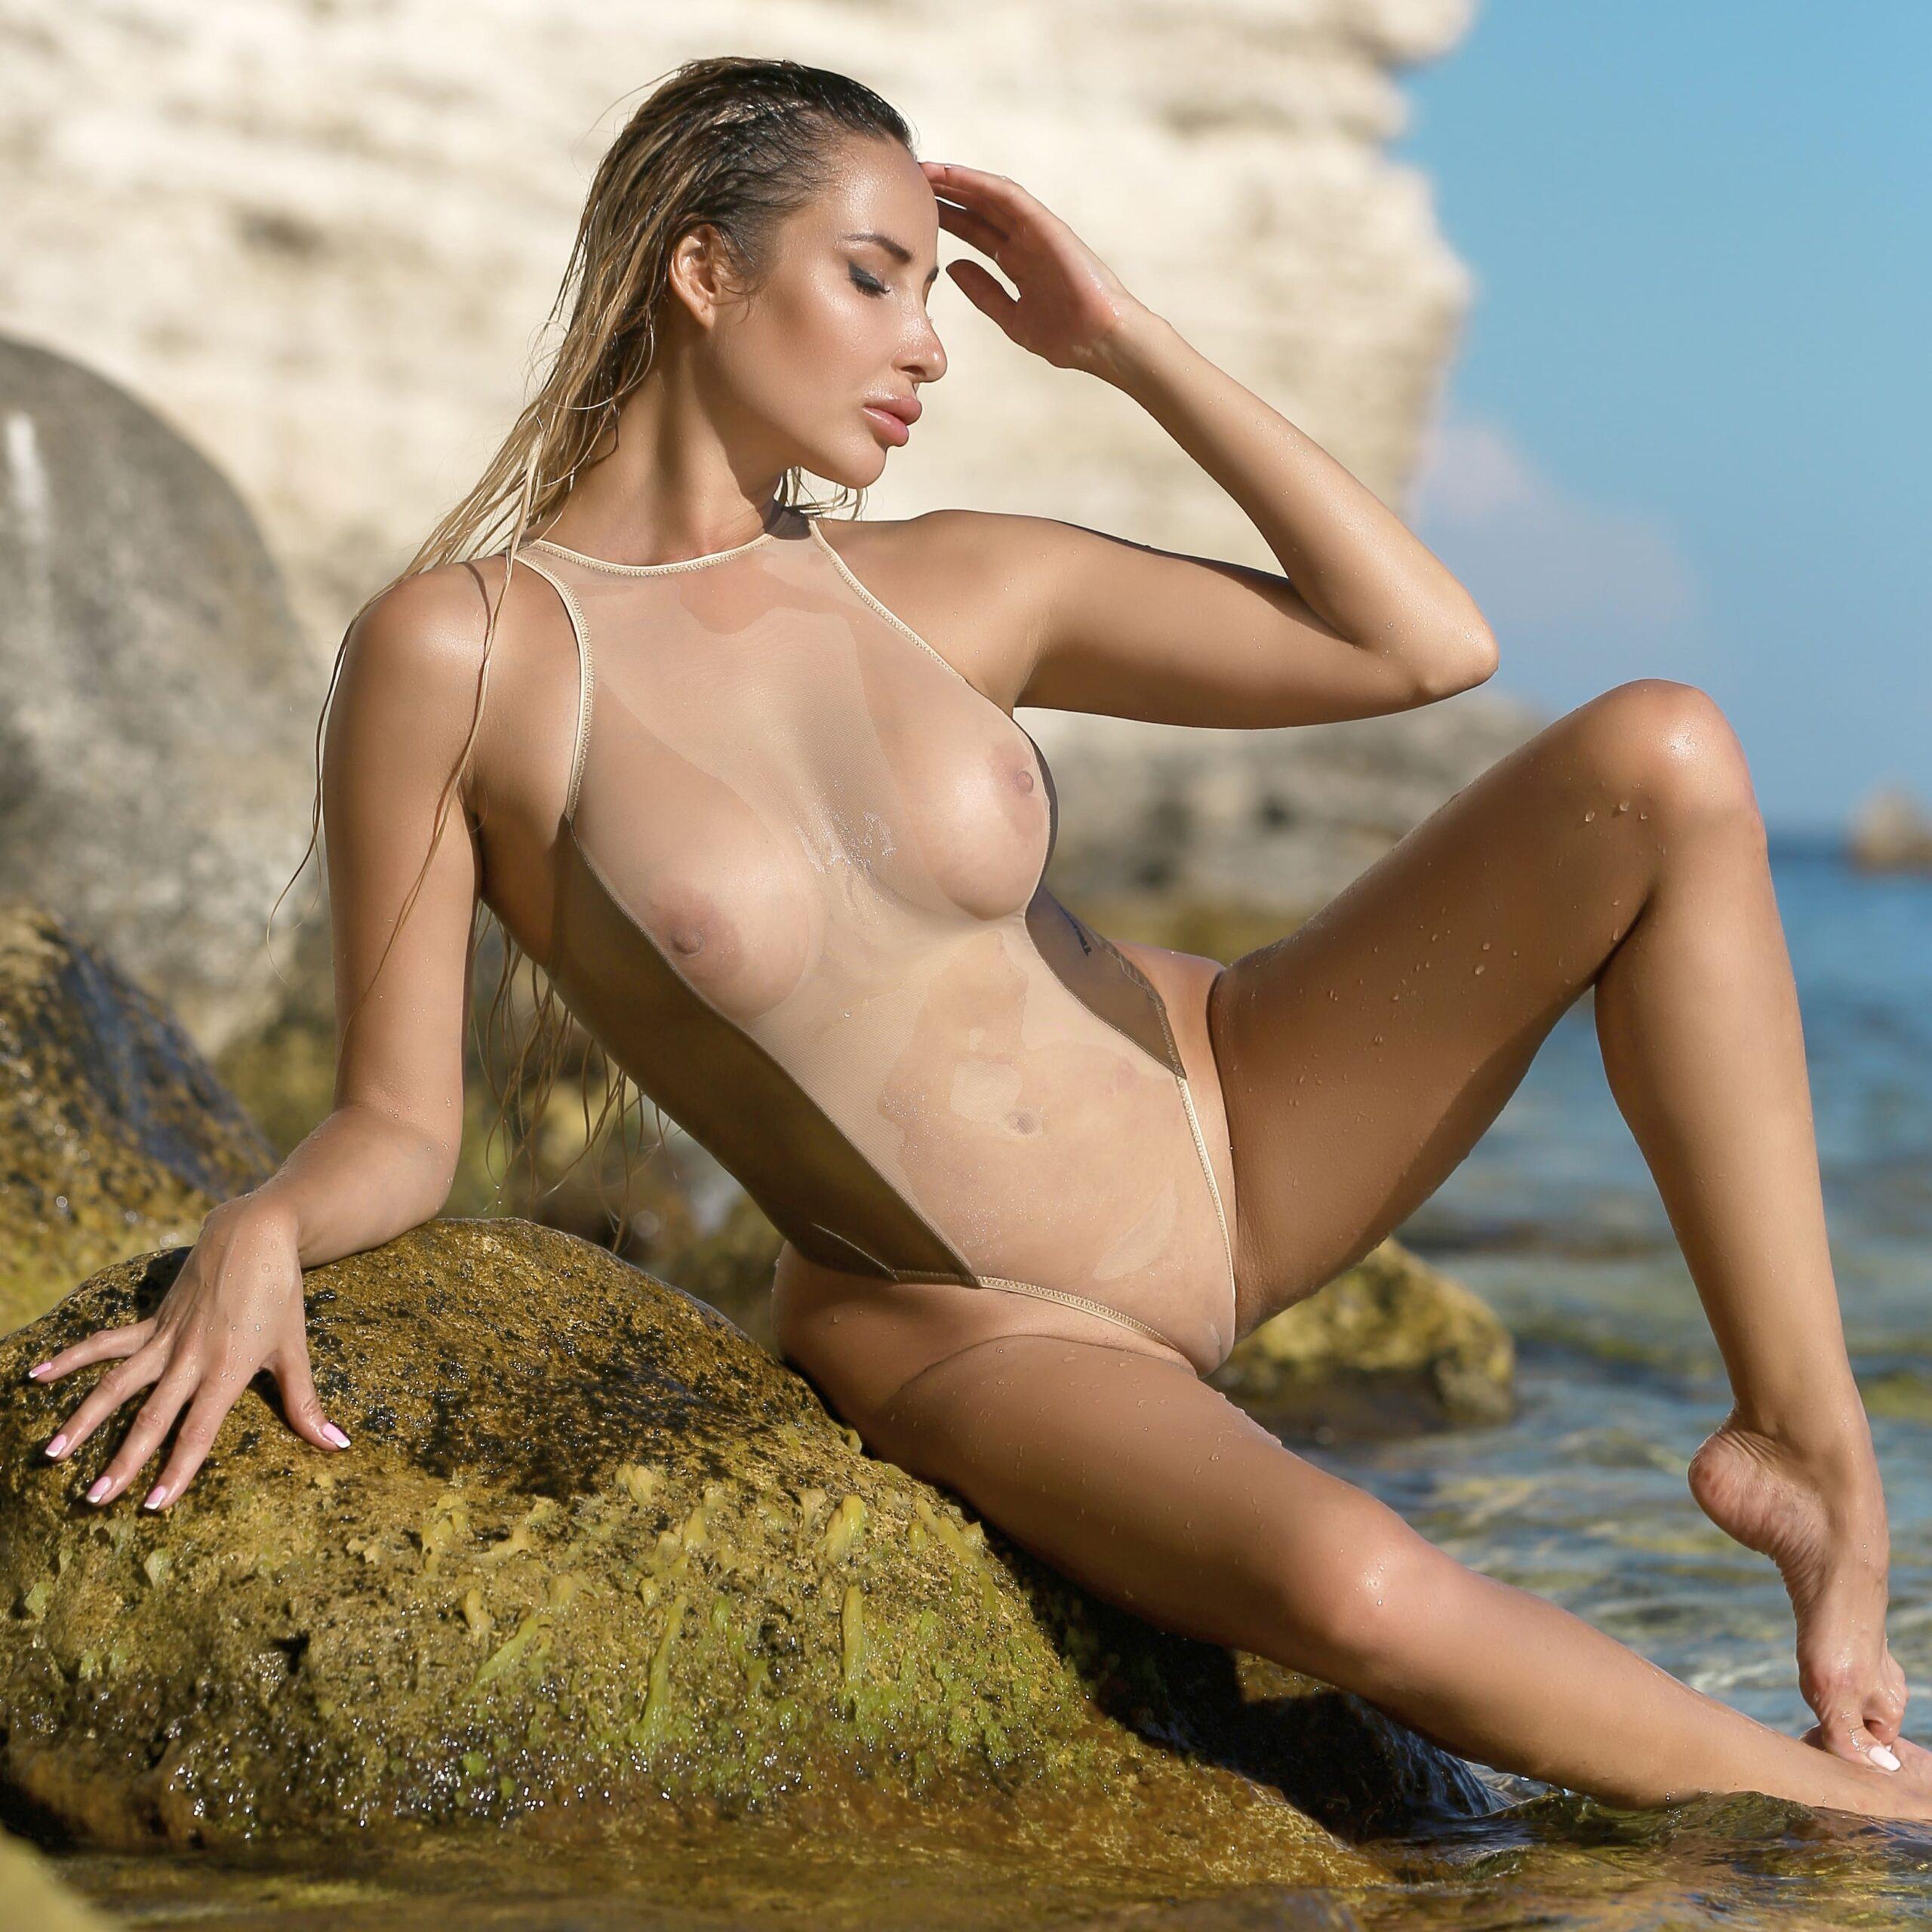 Hot see through one piece thong swimsuit. Cheeky sheer women high neck bodysuit. Sexy high cut leg monokini. Cute high waisted bathing suits.